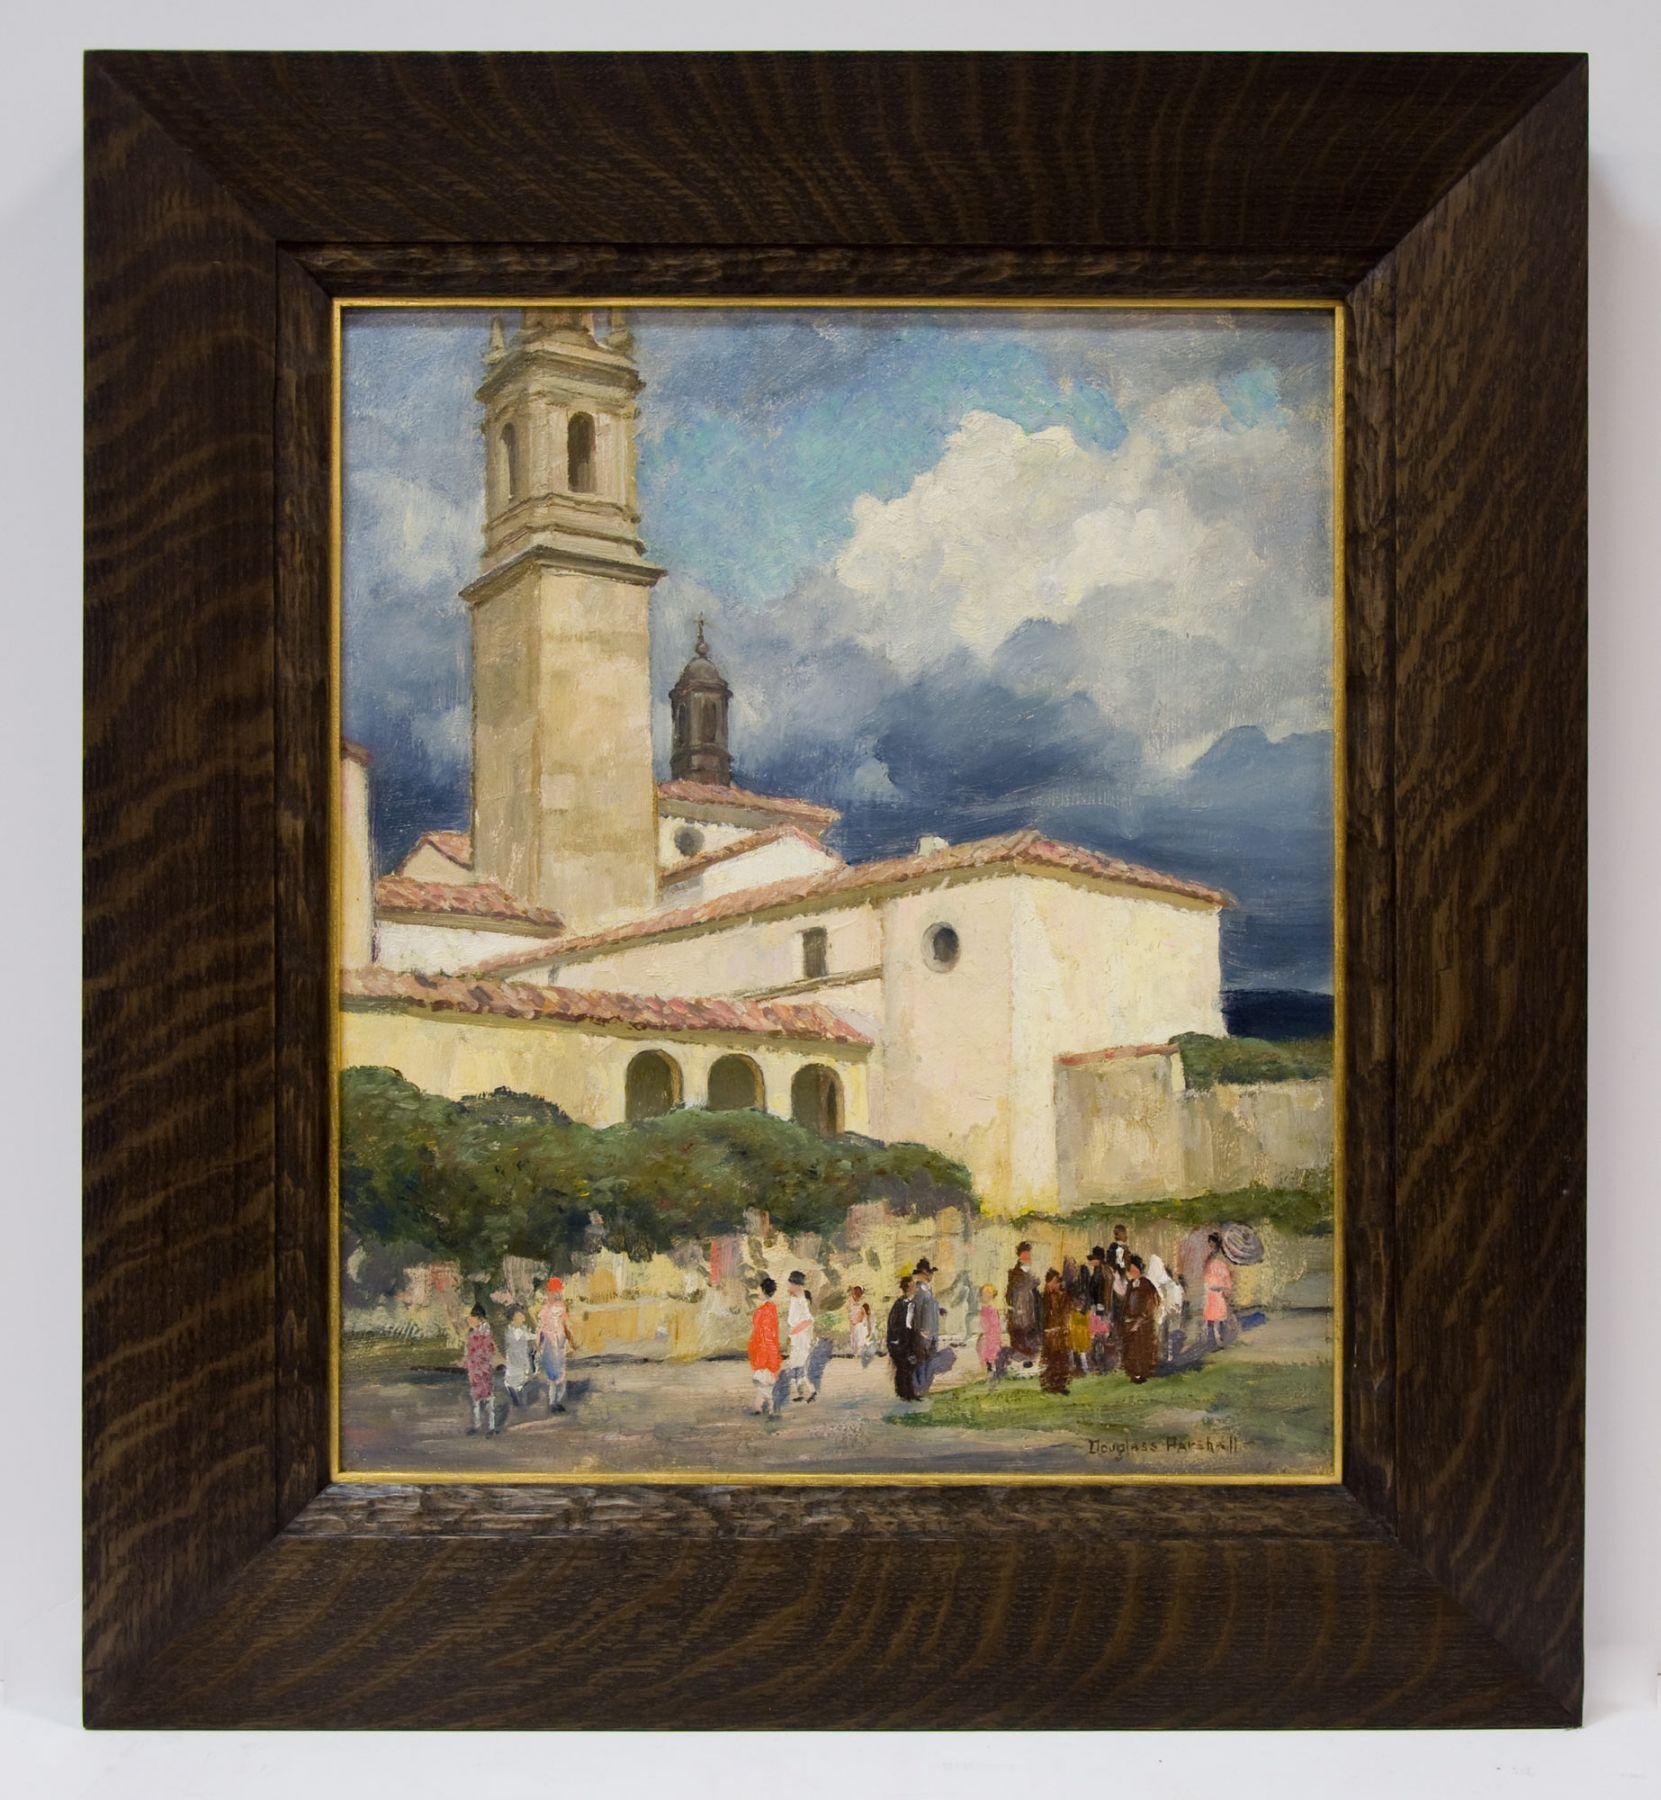 Douglass Parshall (1899-1990), St. Anthony's Monastery